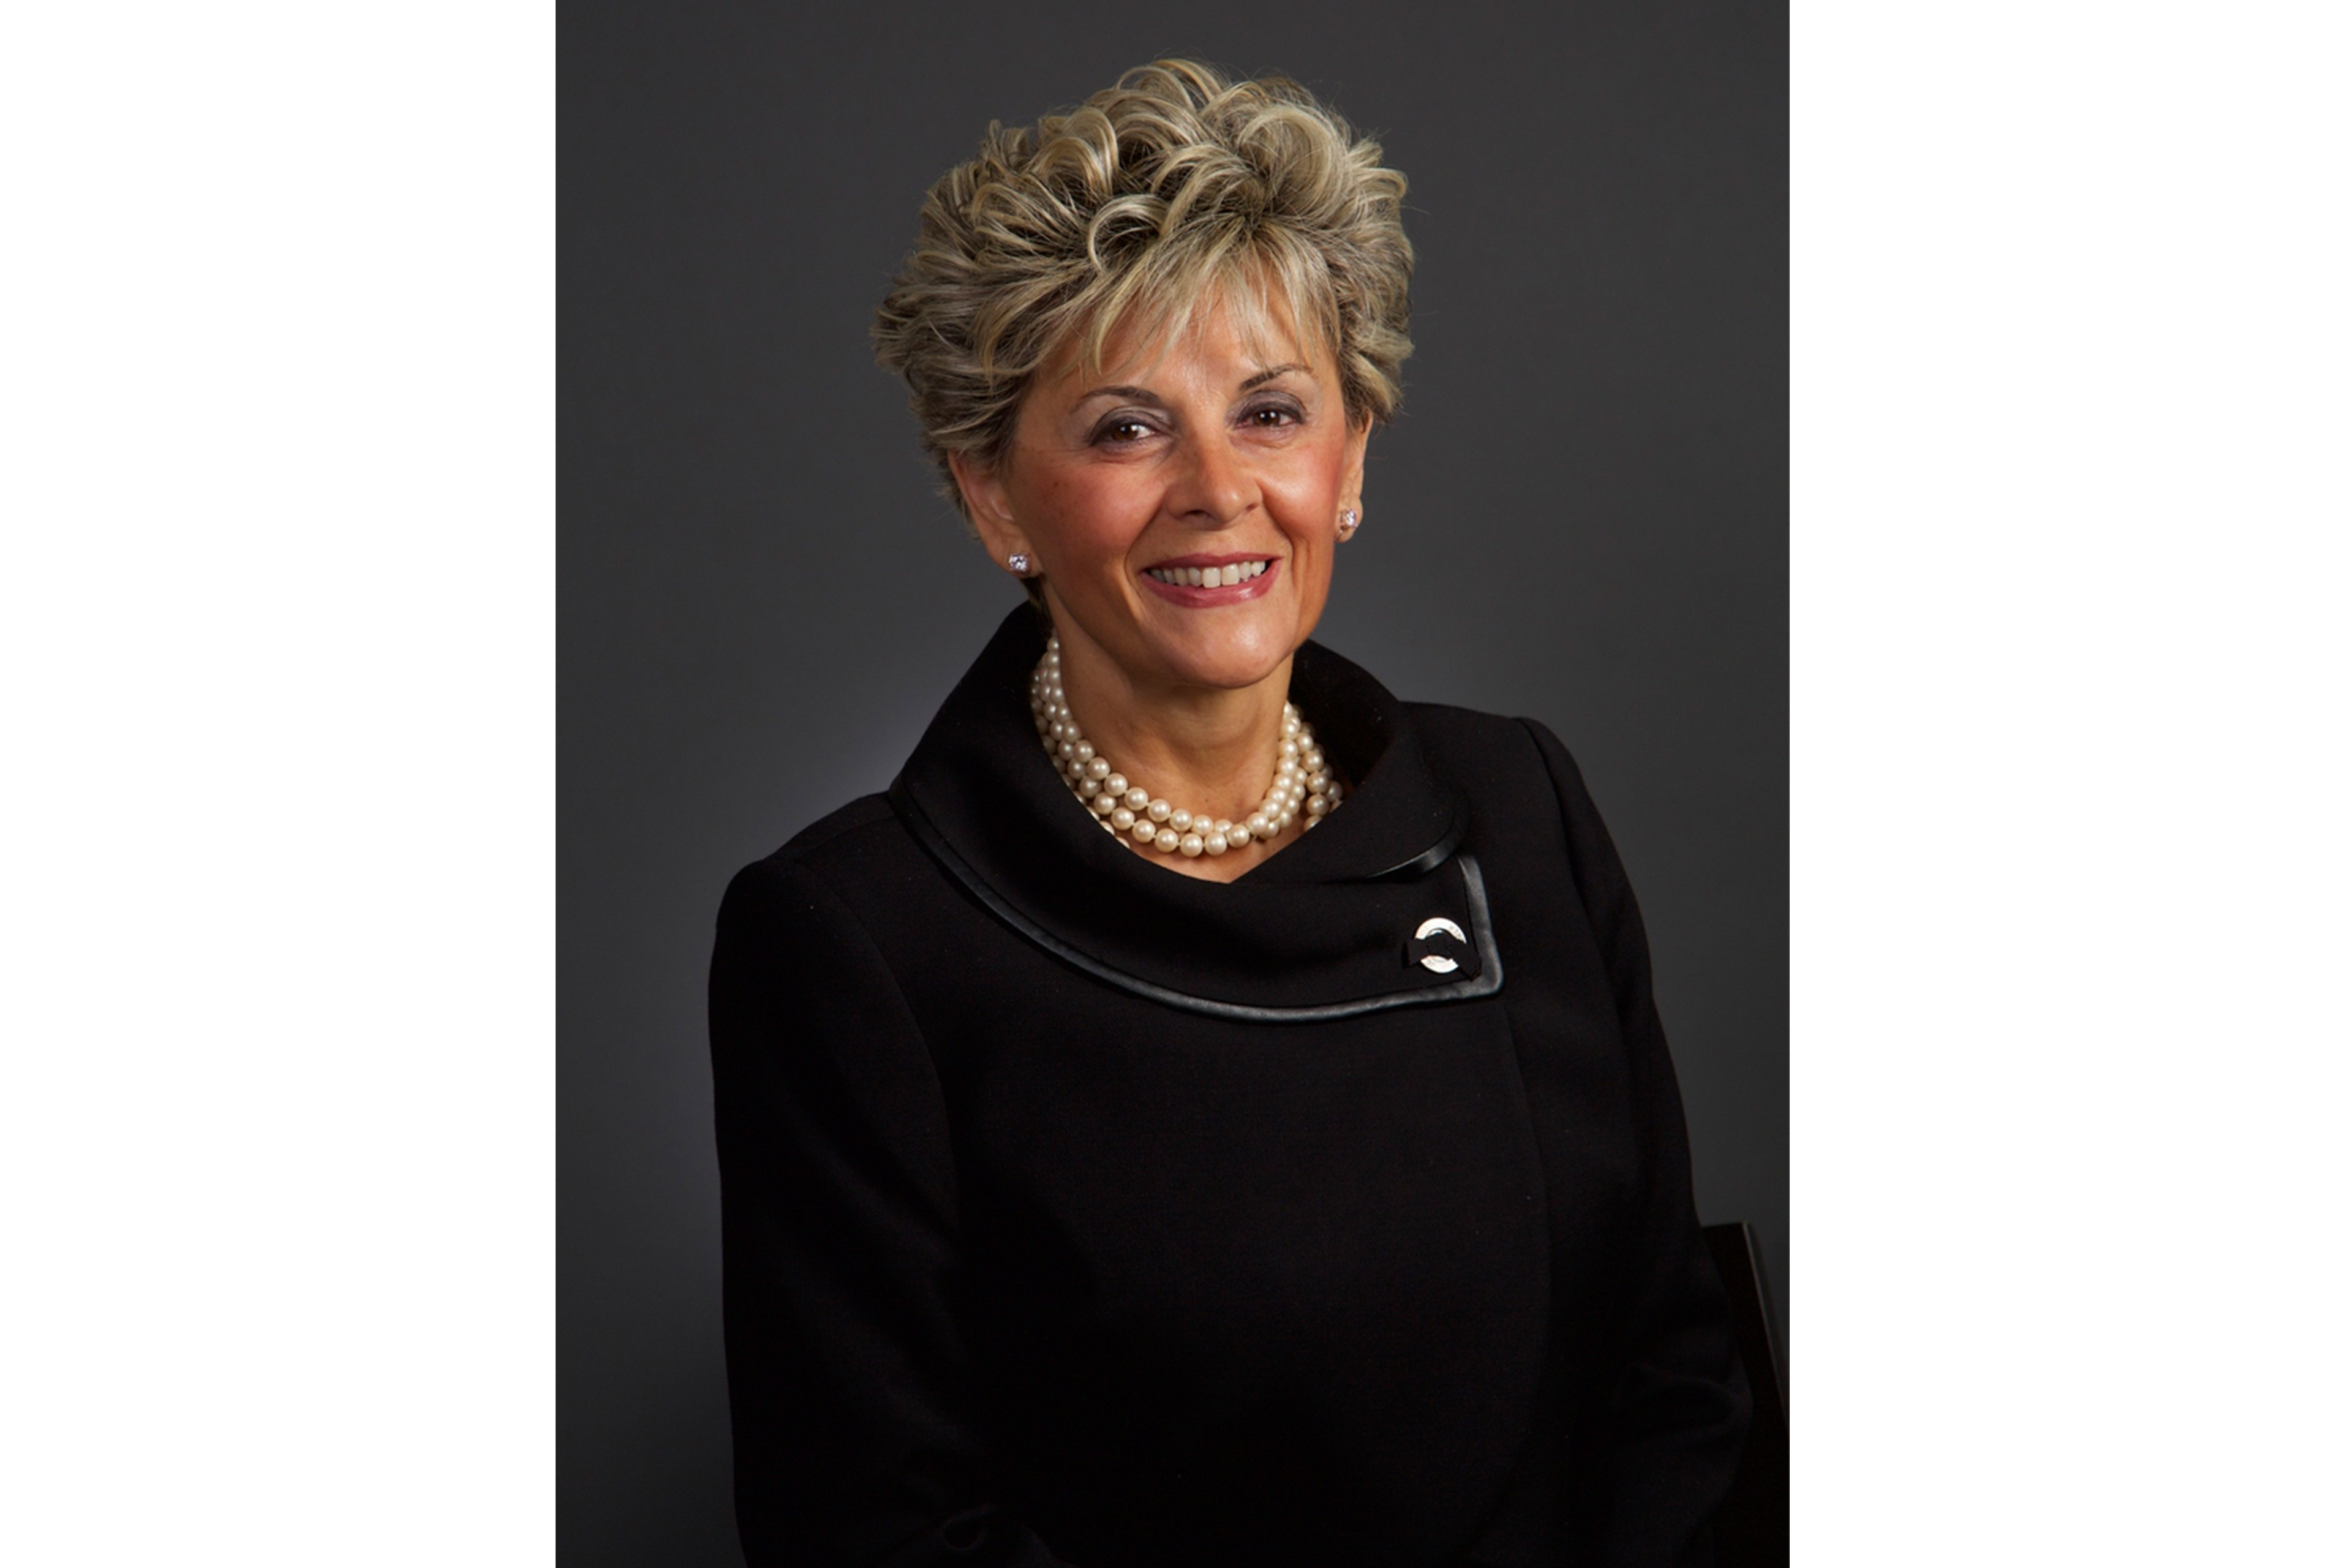 Speaker Rebecca Macdonald